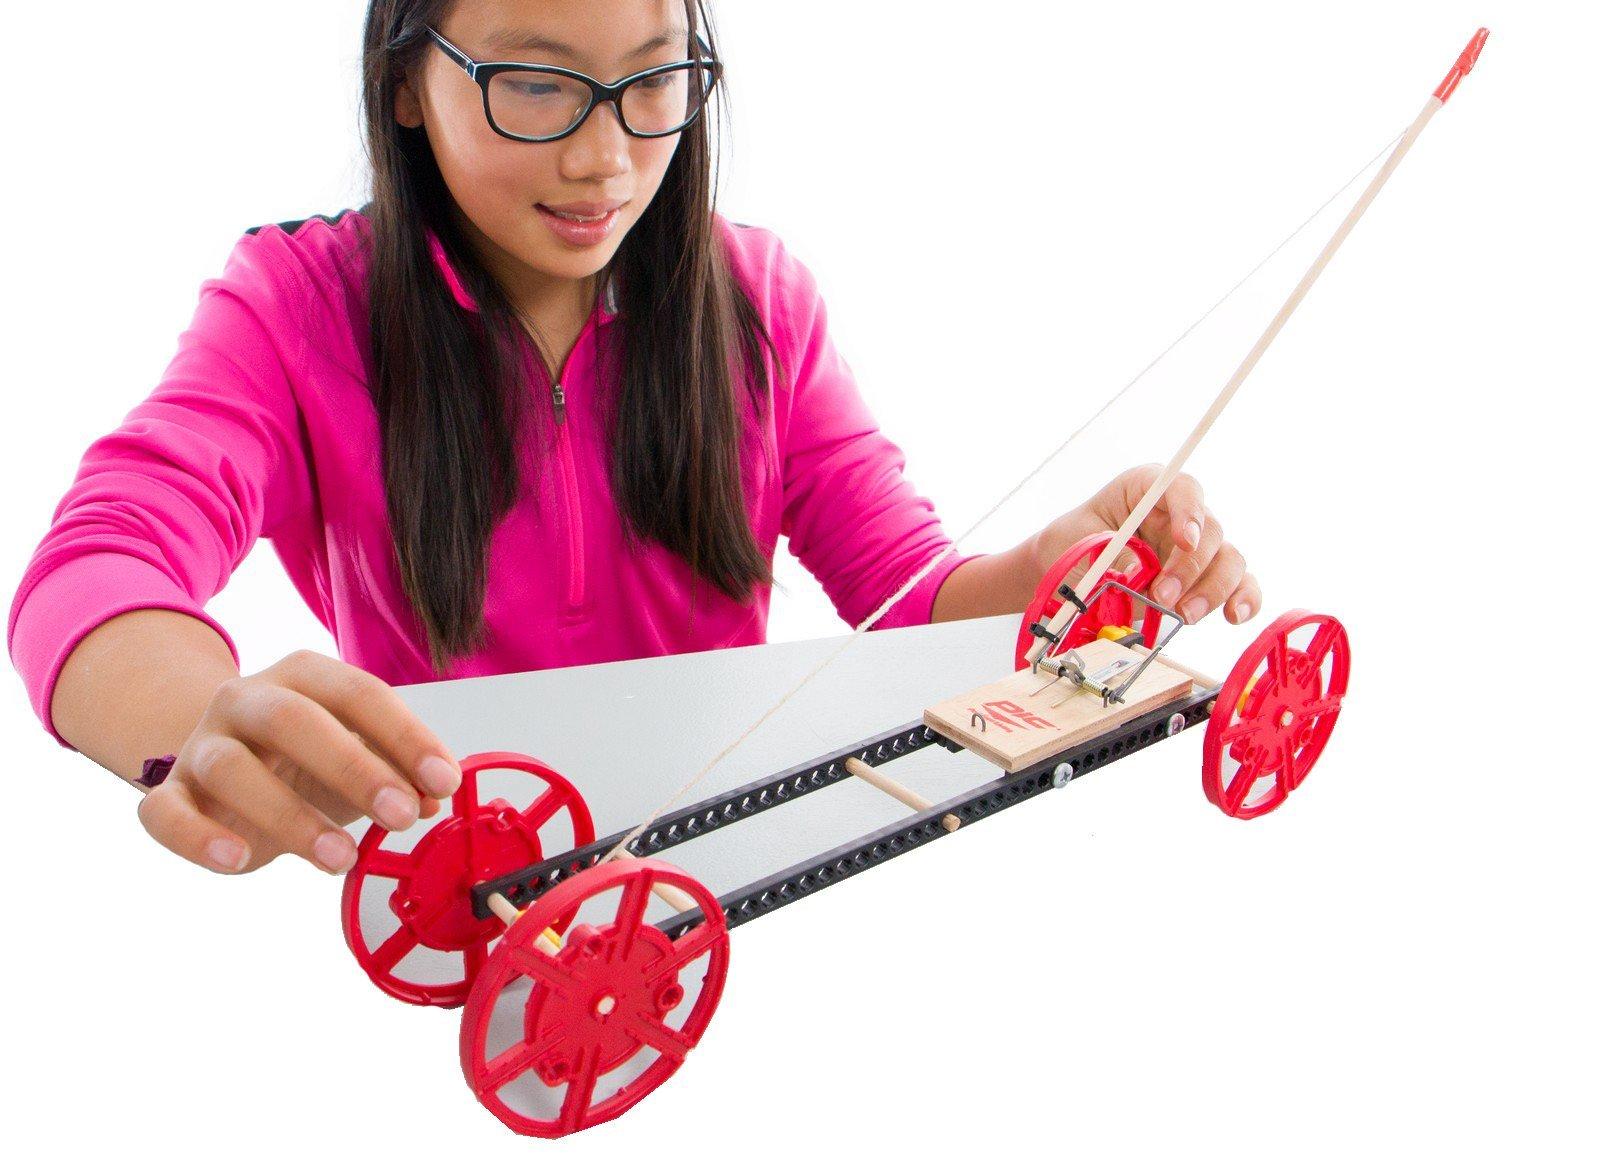 TeacherGeek Mousetrap Powered Vehicle STEM | STEAM Activity Kit